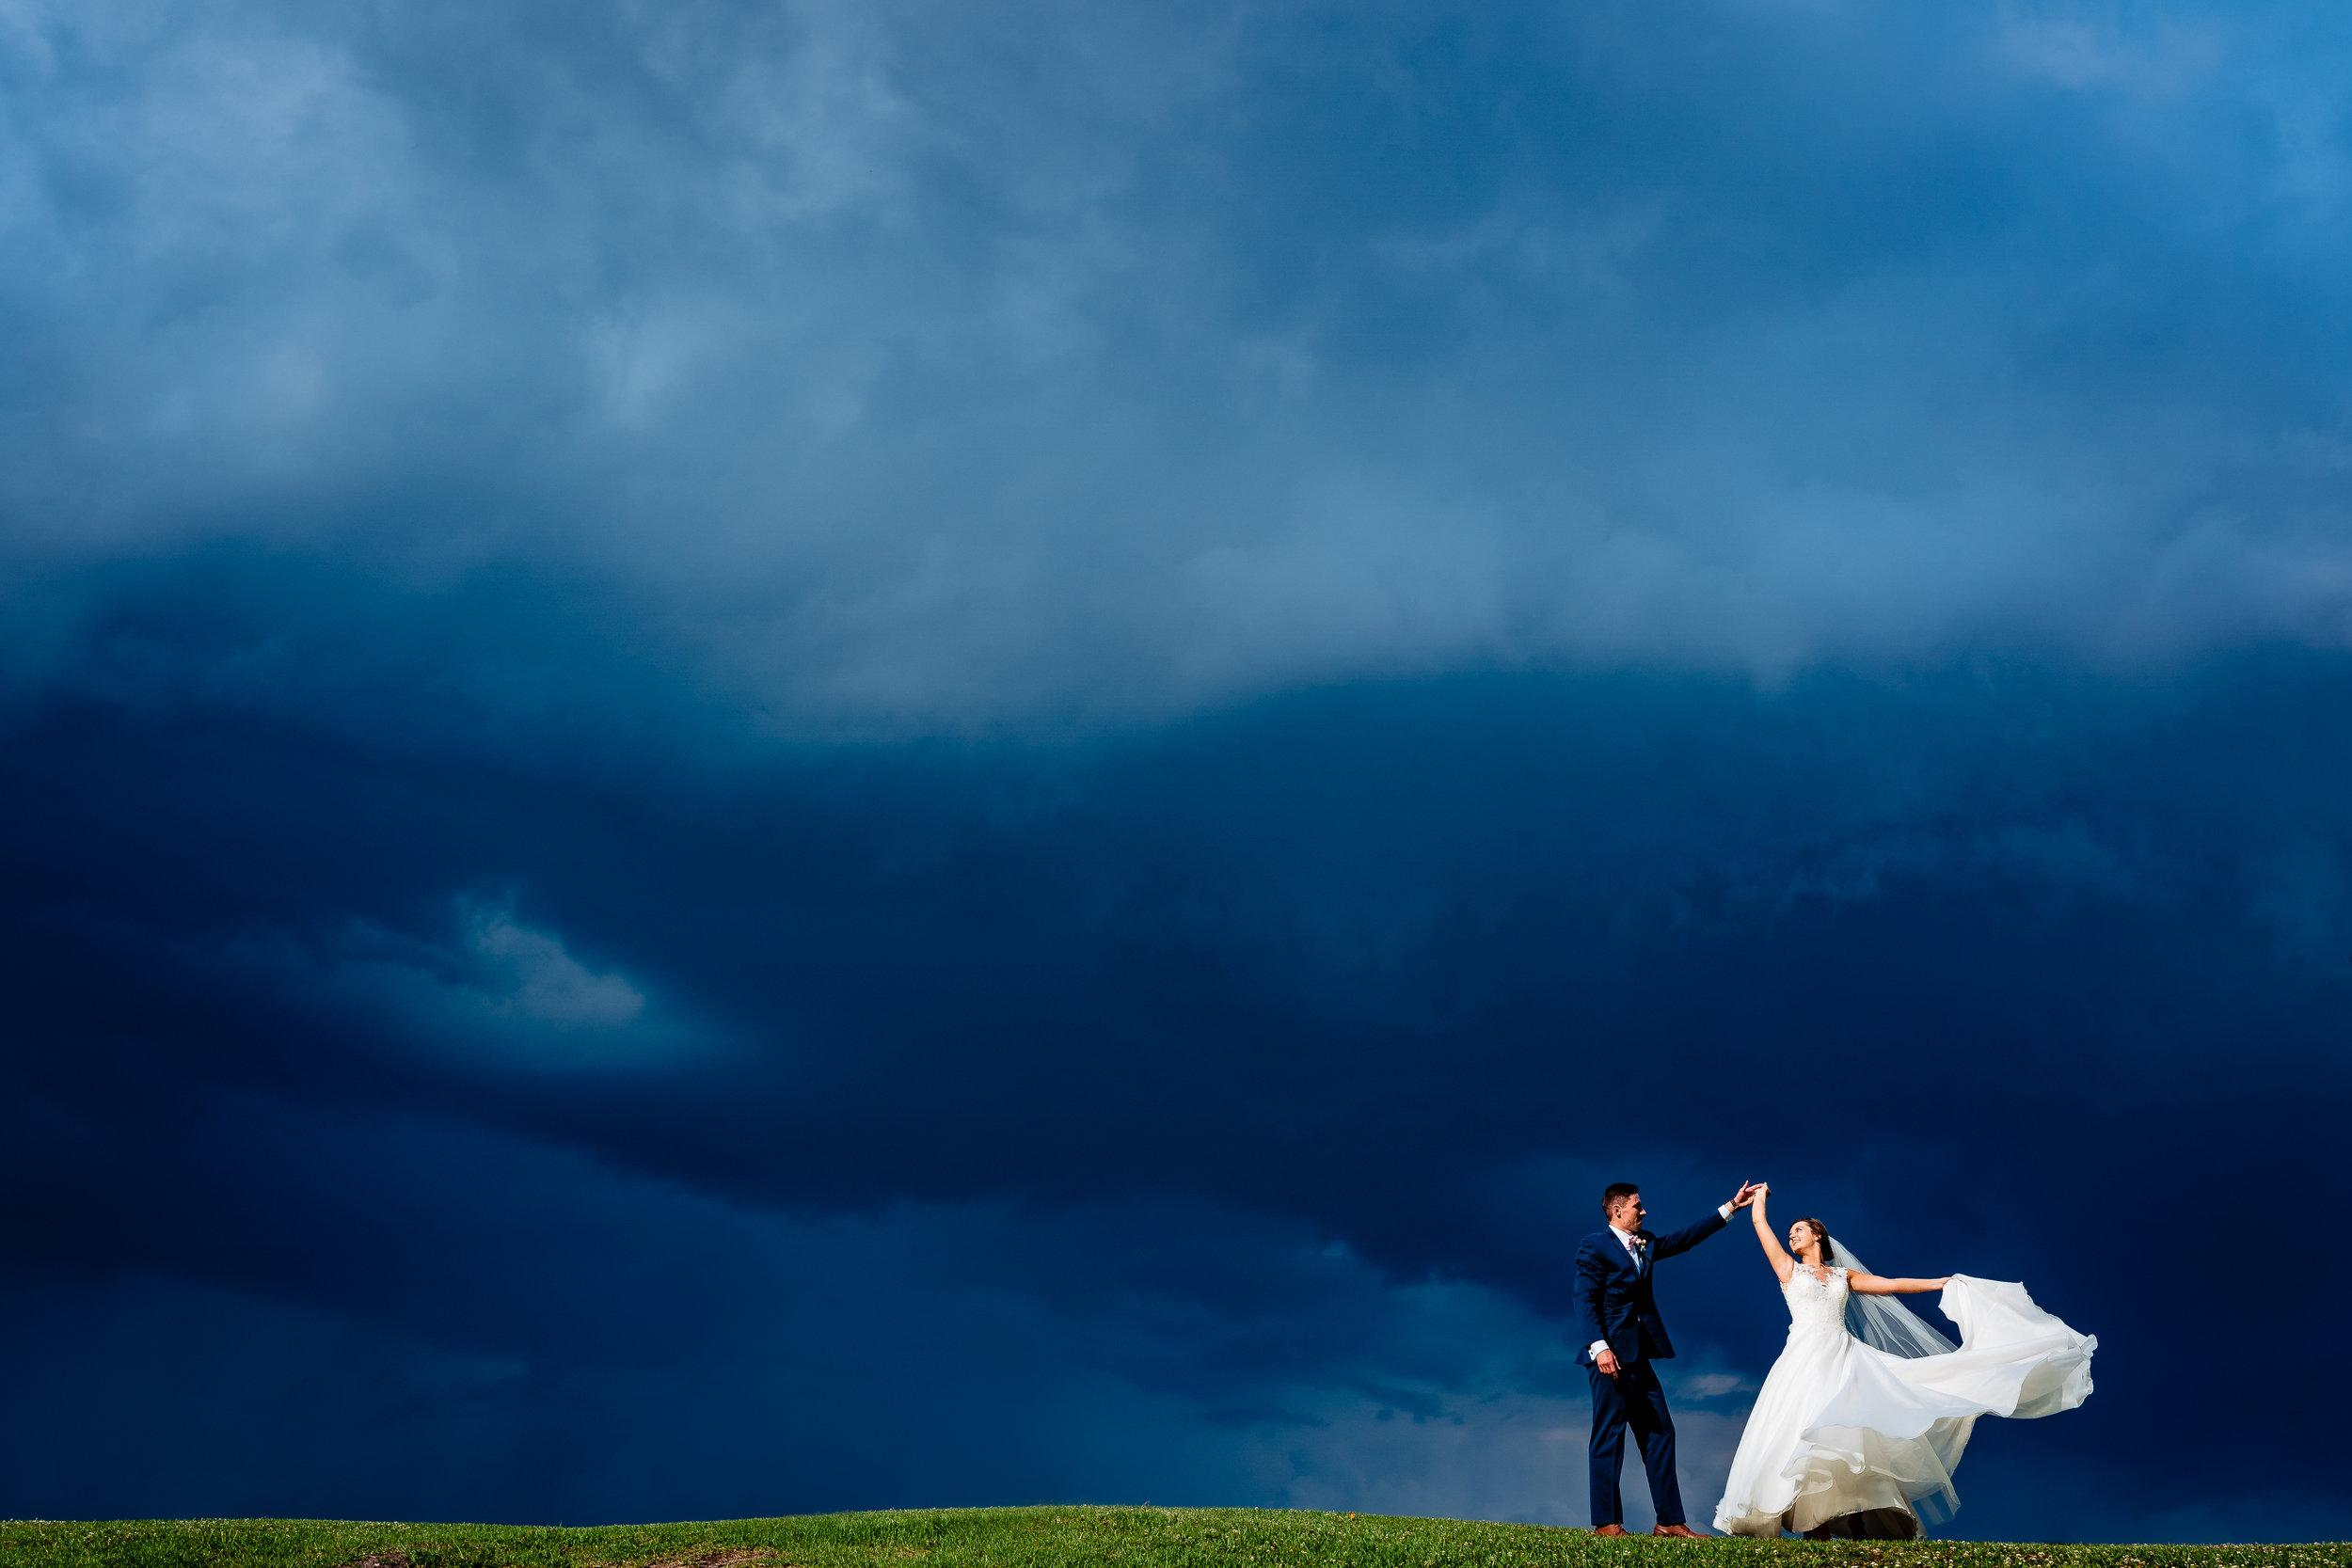 The Best New Bern NC Wedding Photographer